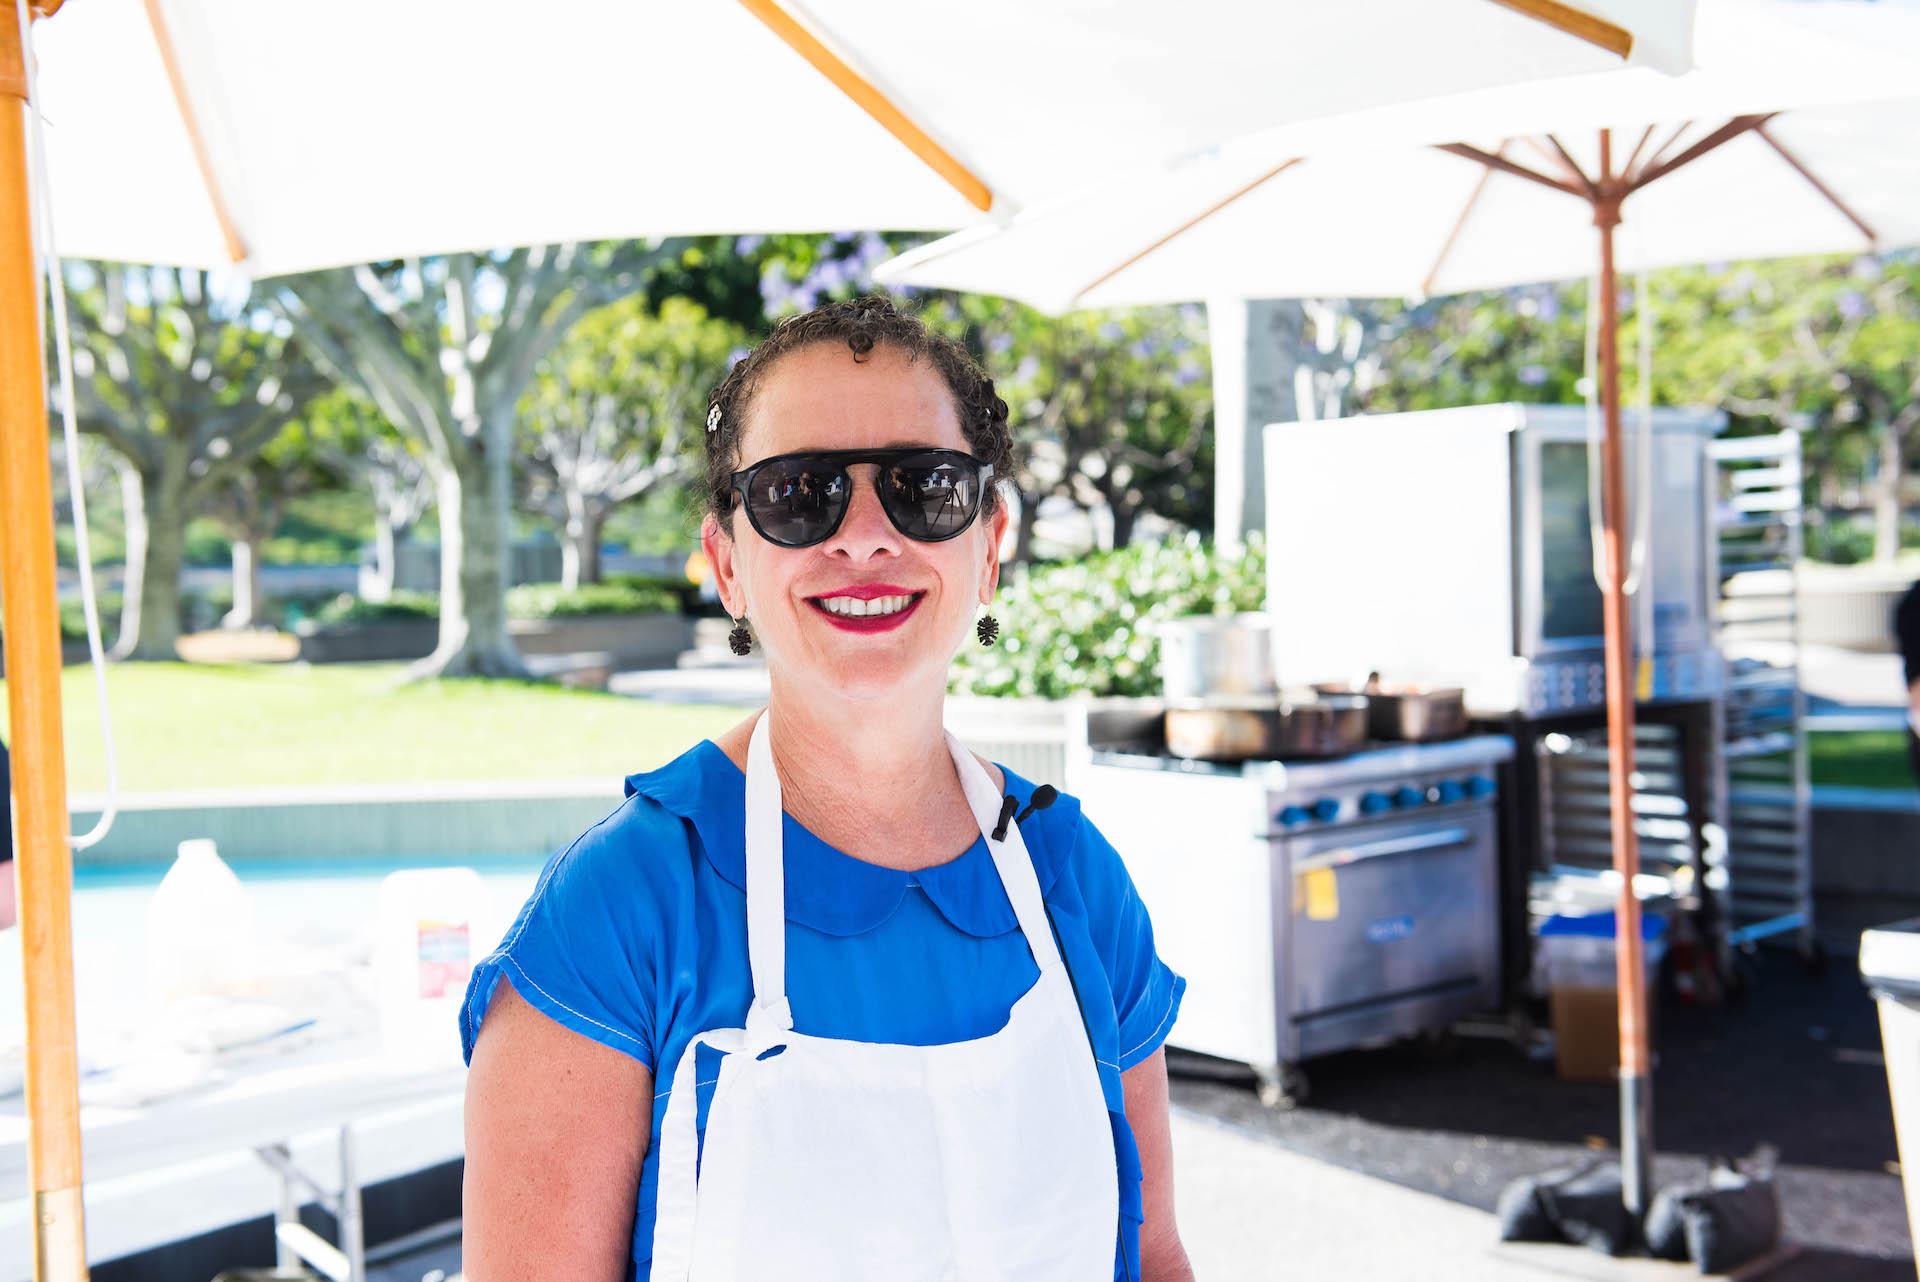 Nancy Silverton, chef and owner of Pizzeria Mozza, Osteria Mozza, and chi SPACCA.